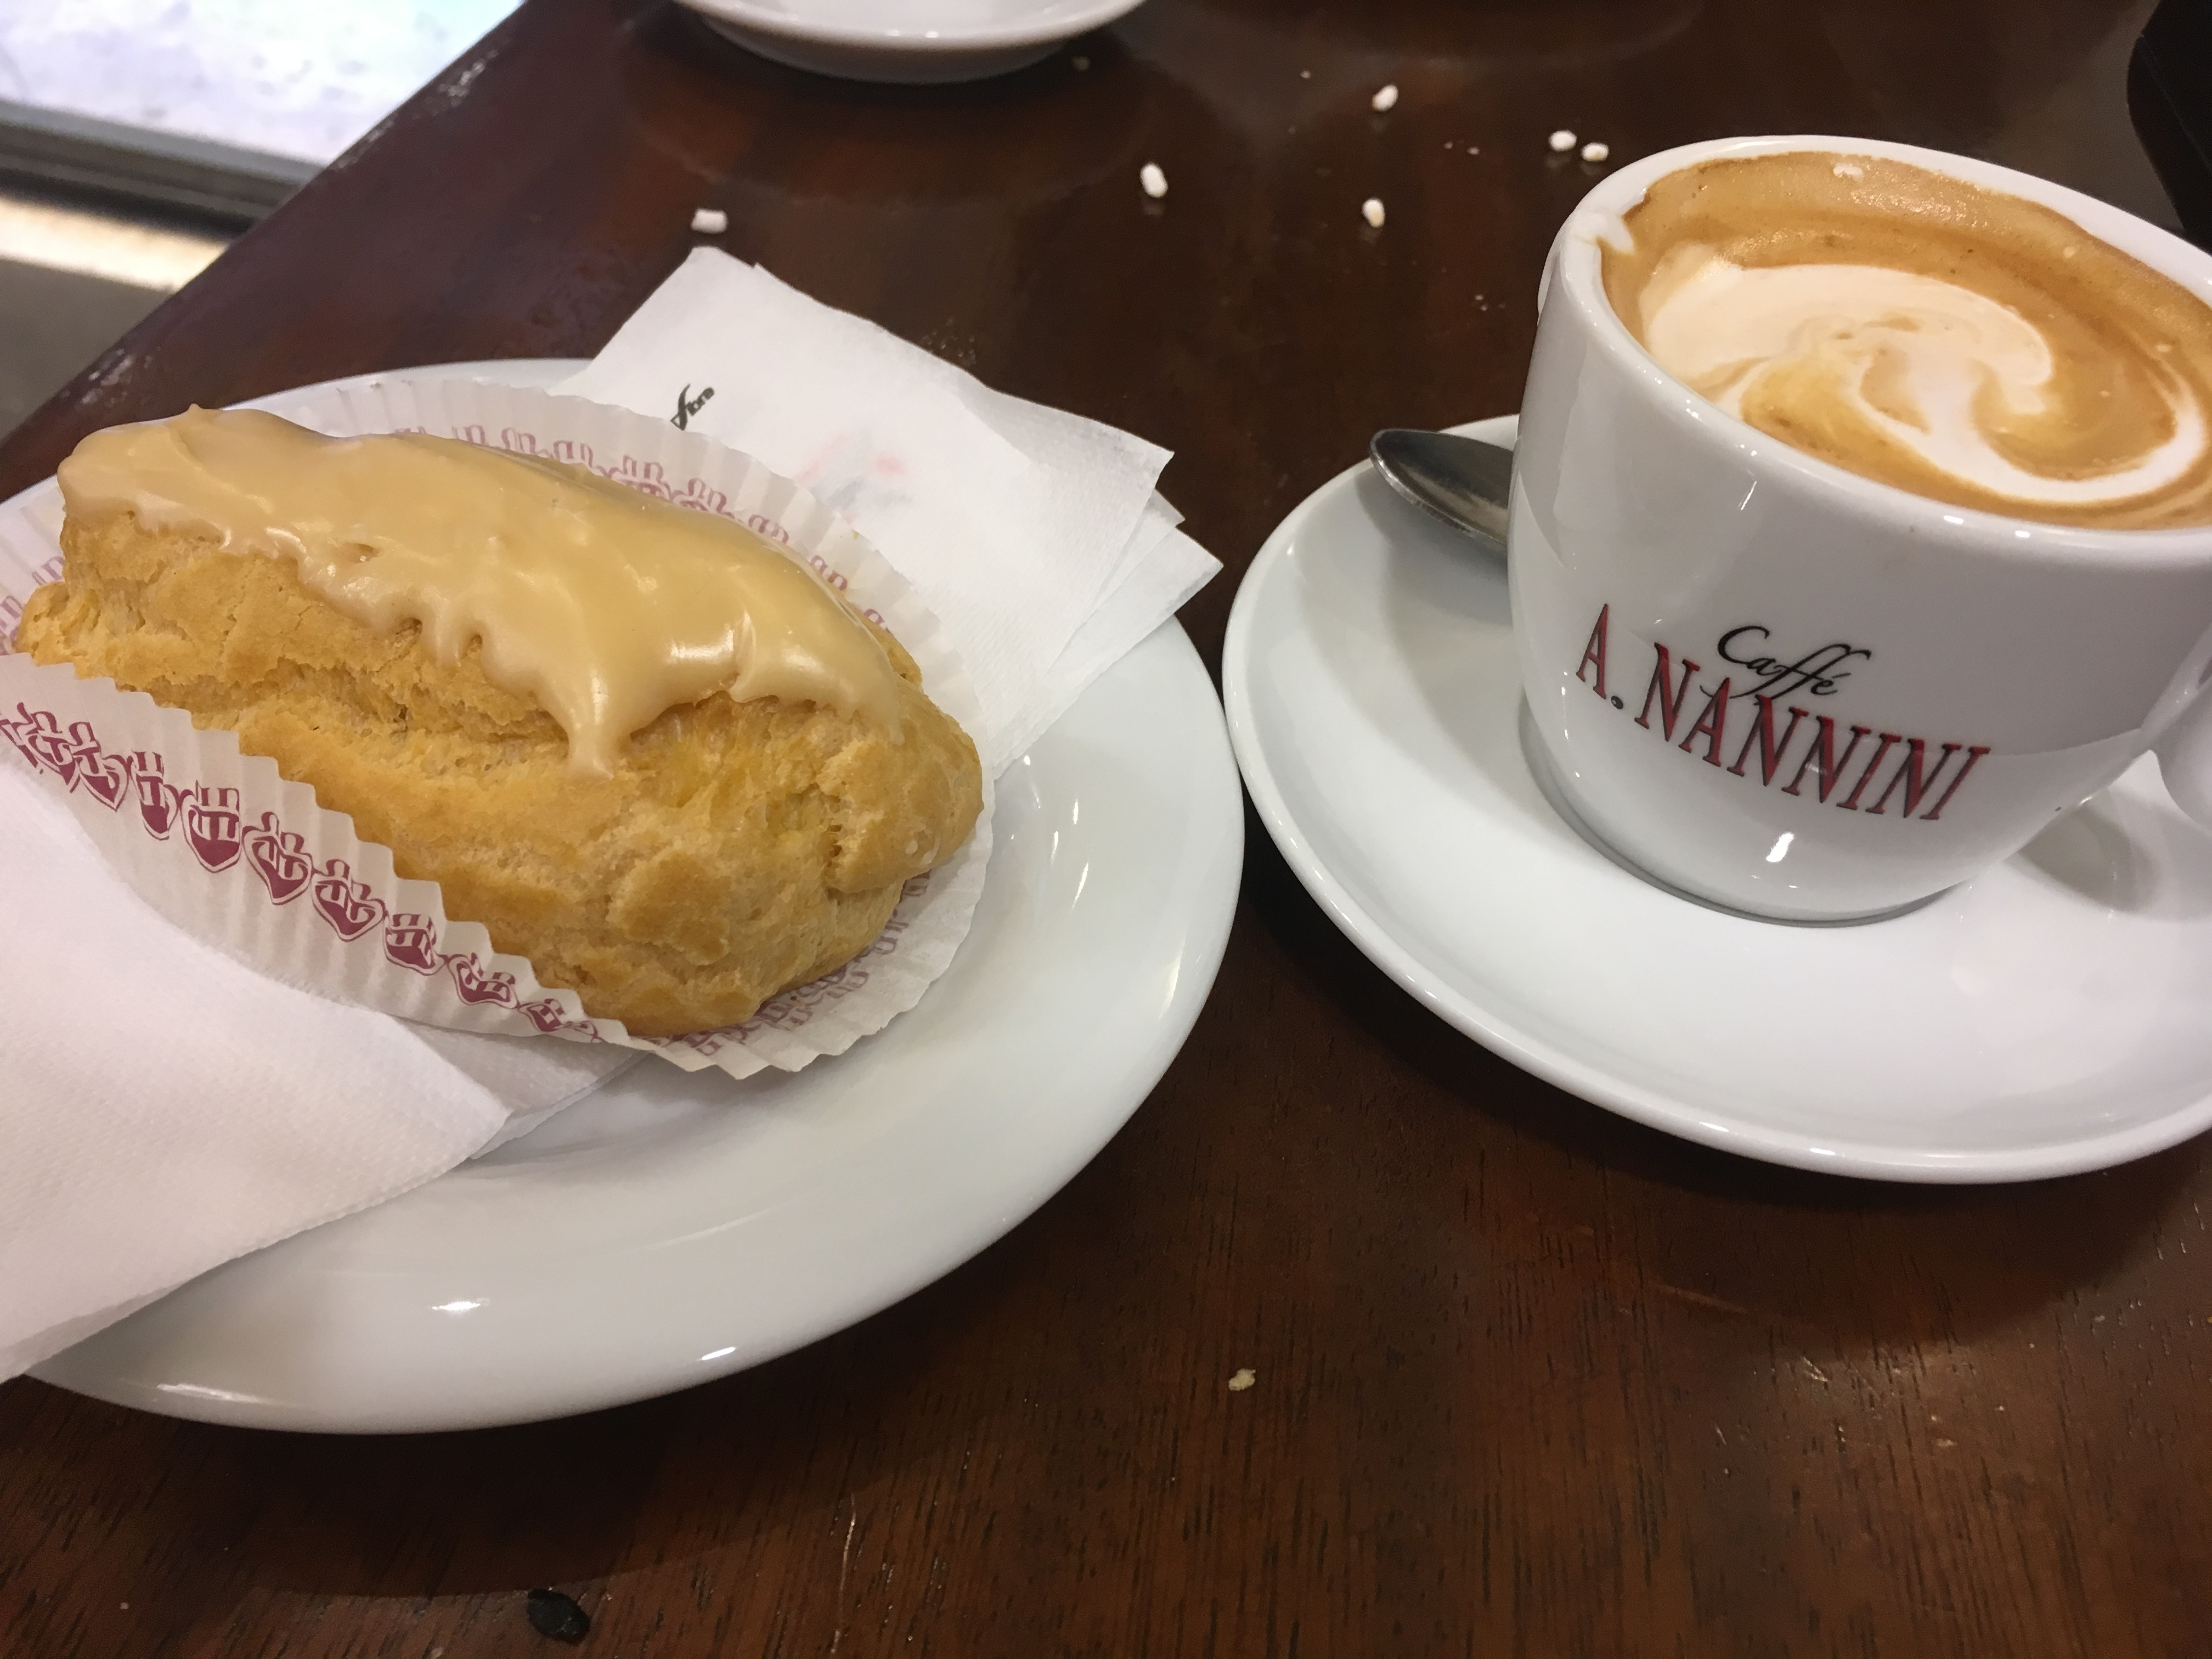 Siena Cafe Nannini